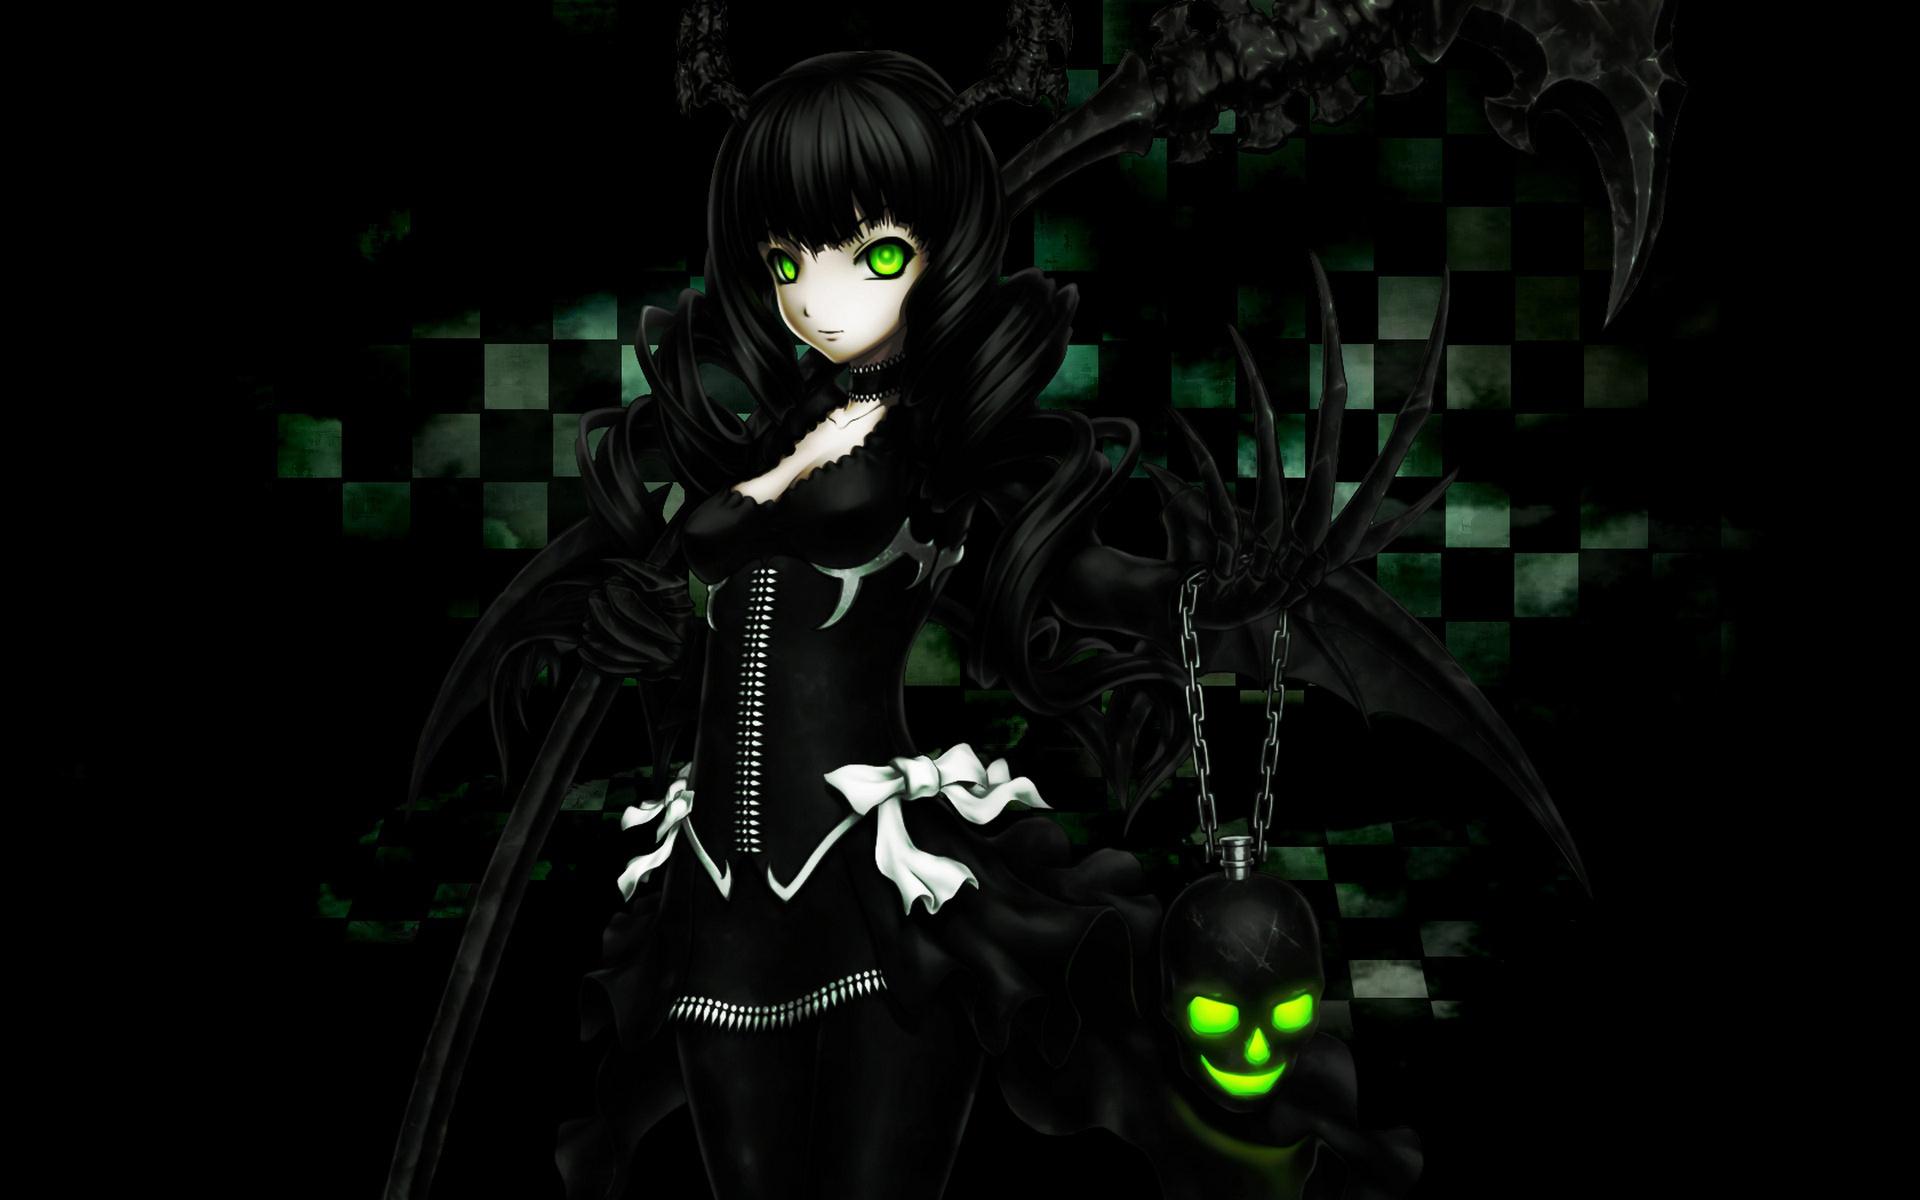 Black rock shooter hd wallpaper background image - Dark anime girl pics ...